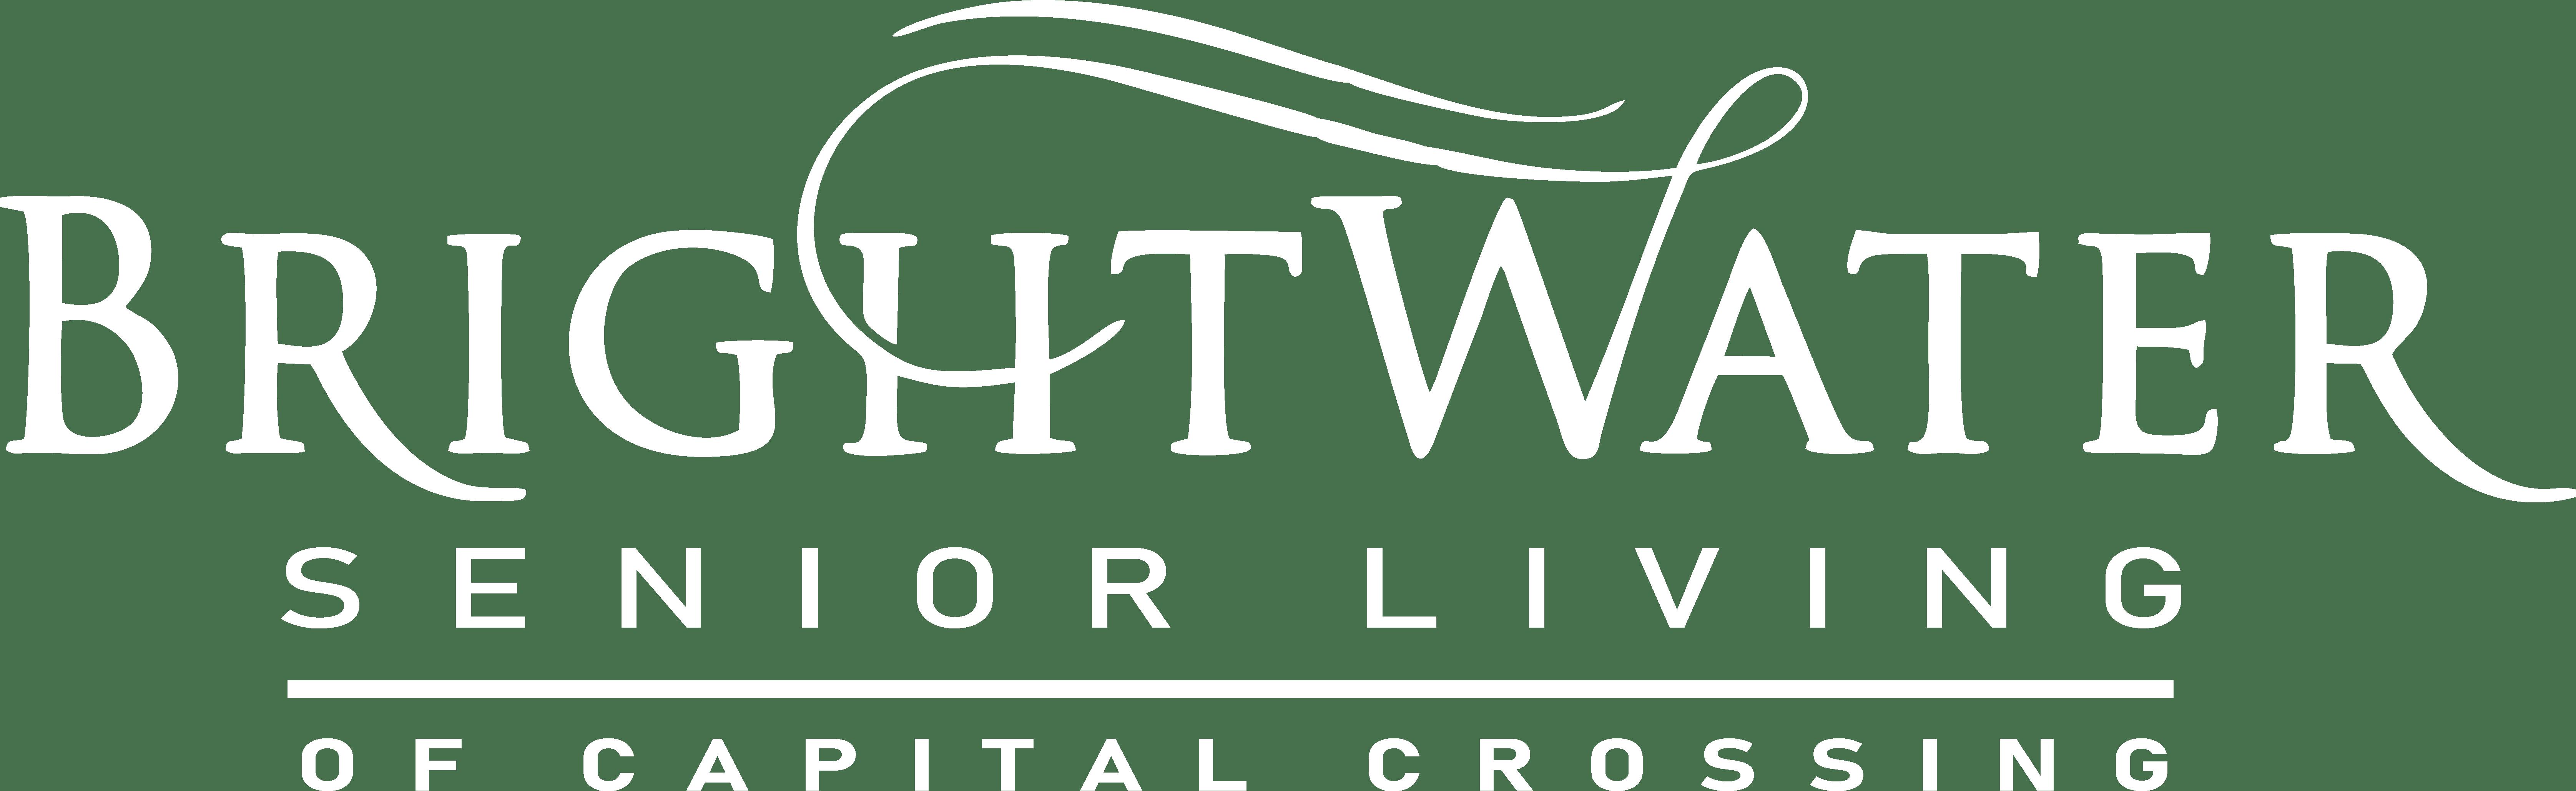 The logo for Brightwater Senior Living of Capital Crossing in Regina, Saskatchewan